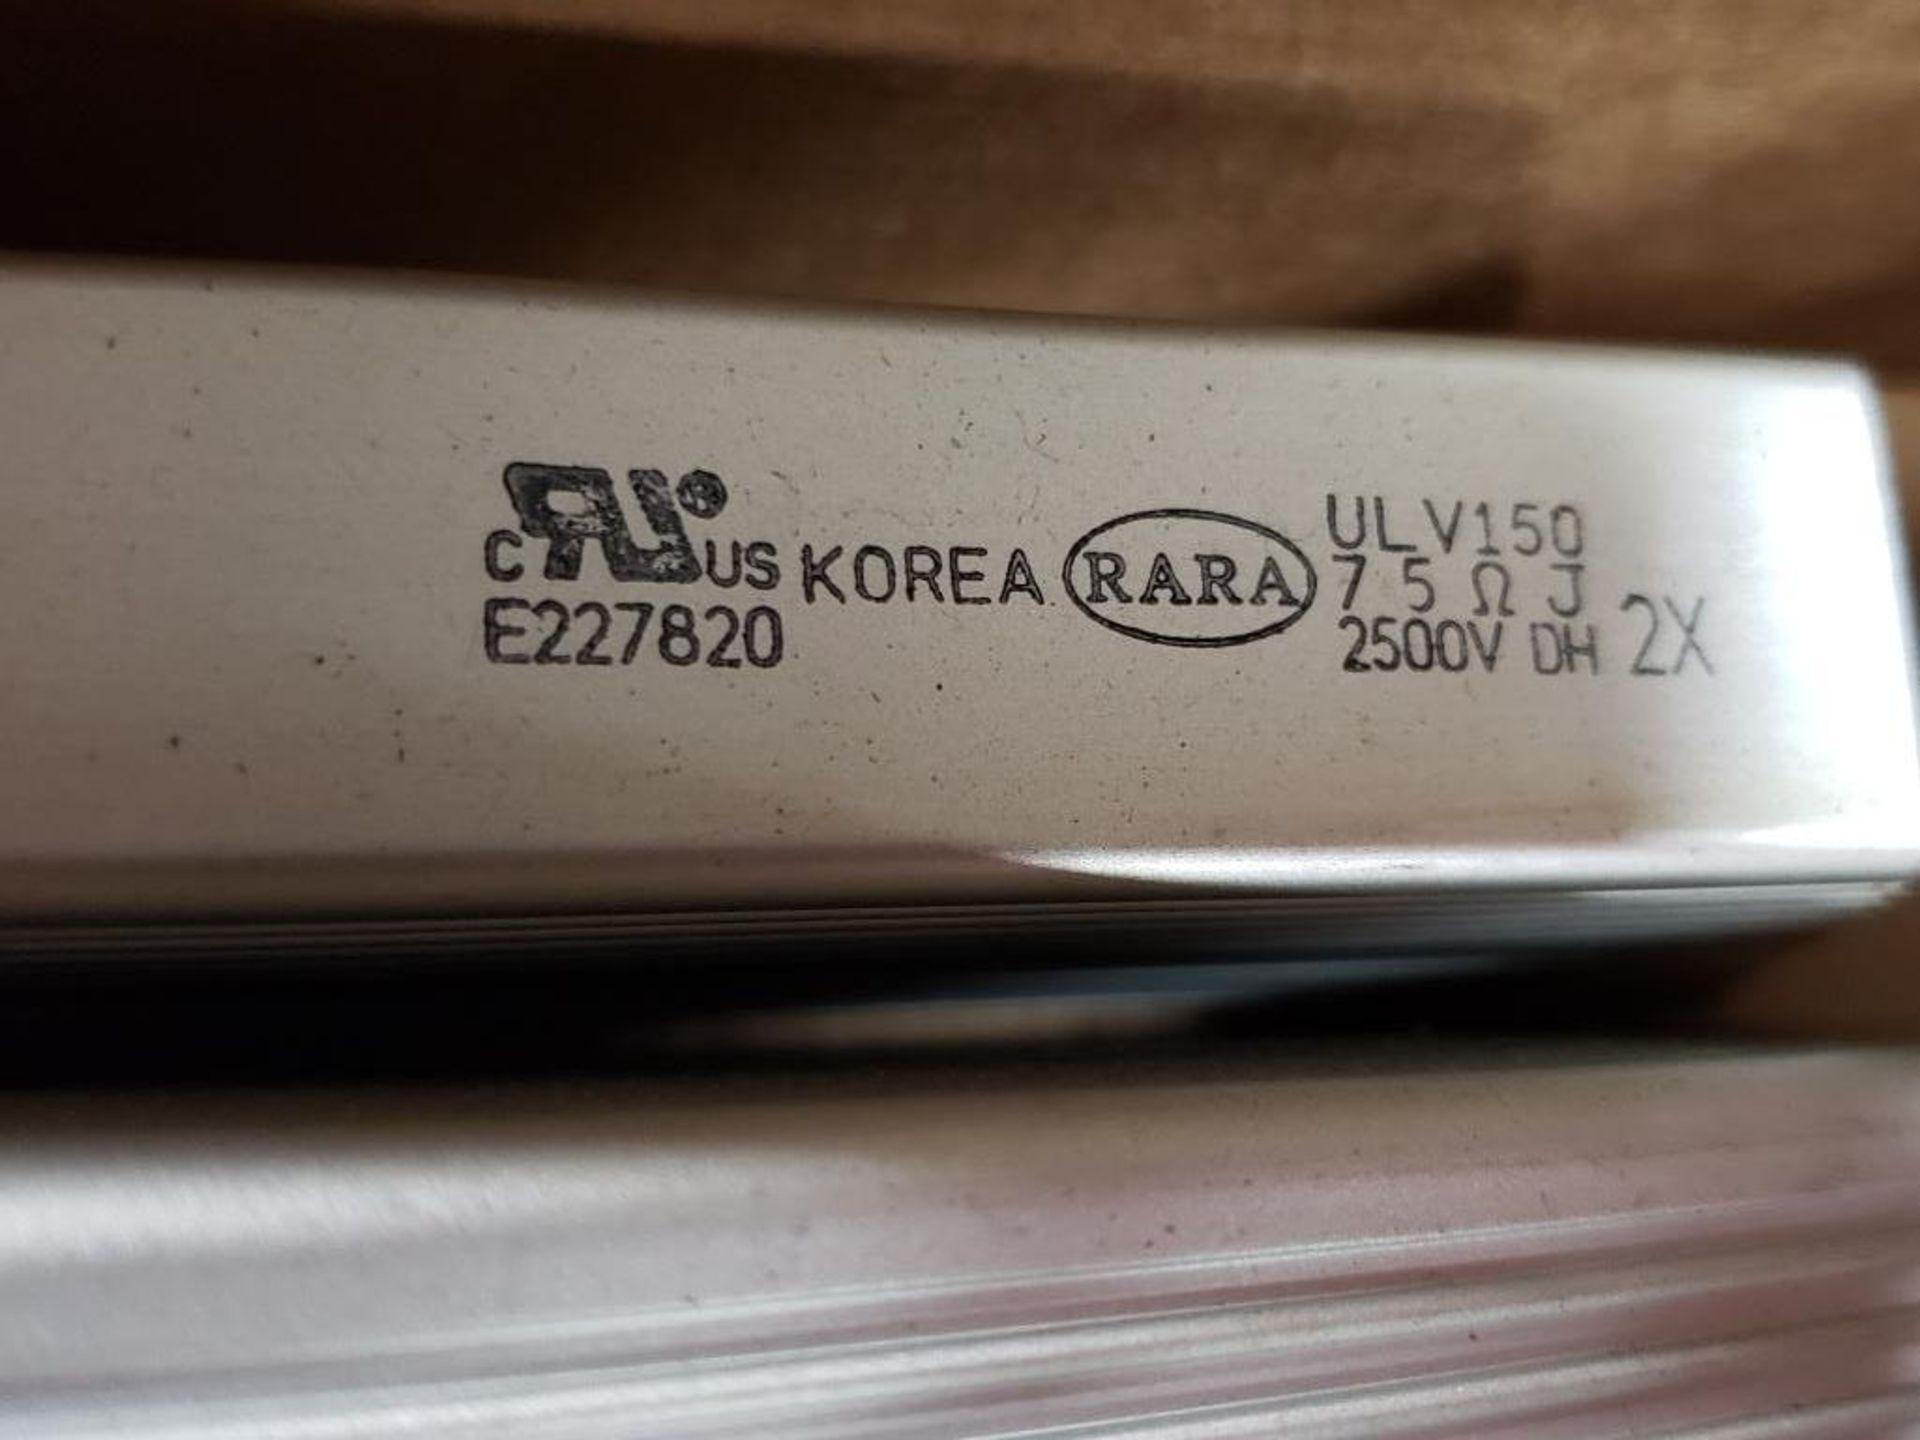 Qty 2 - Rara RXLG-H-T-500W resistor. E227820. - Image 2 of 3